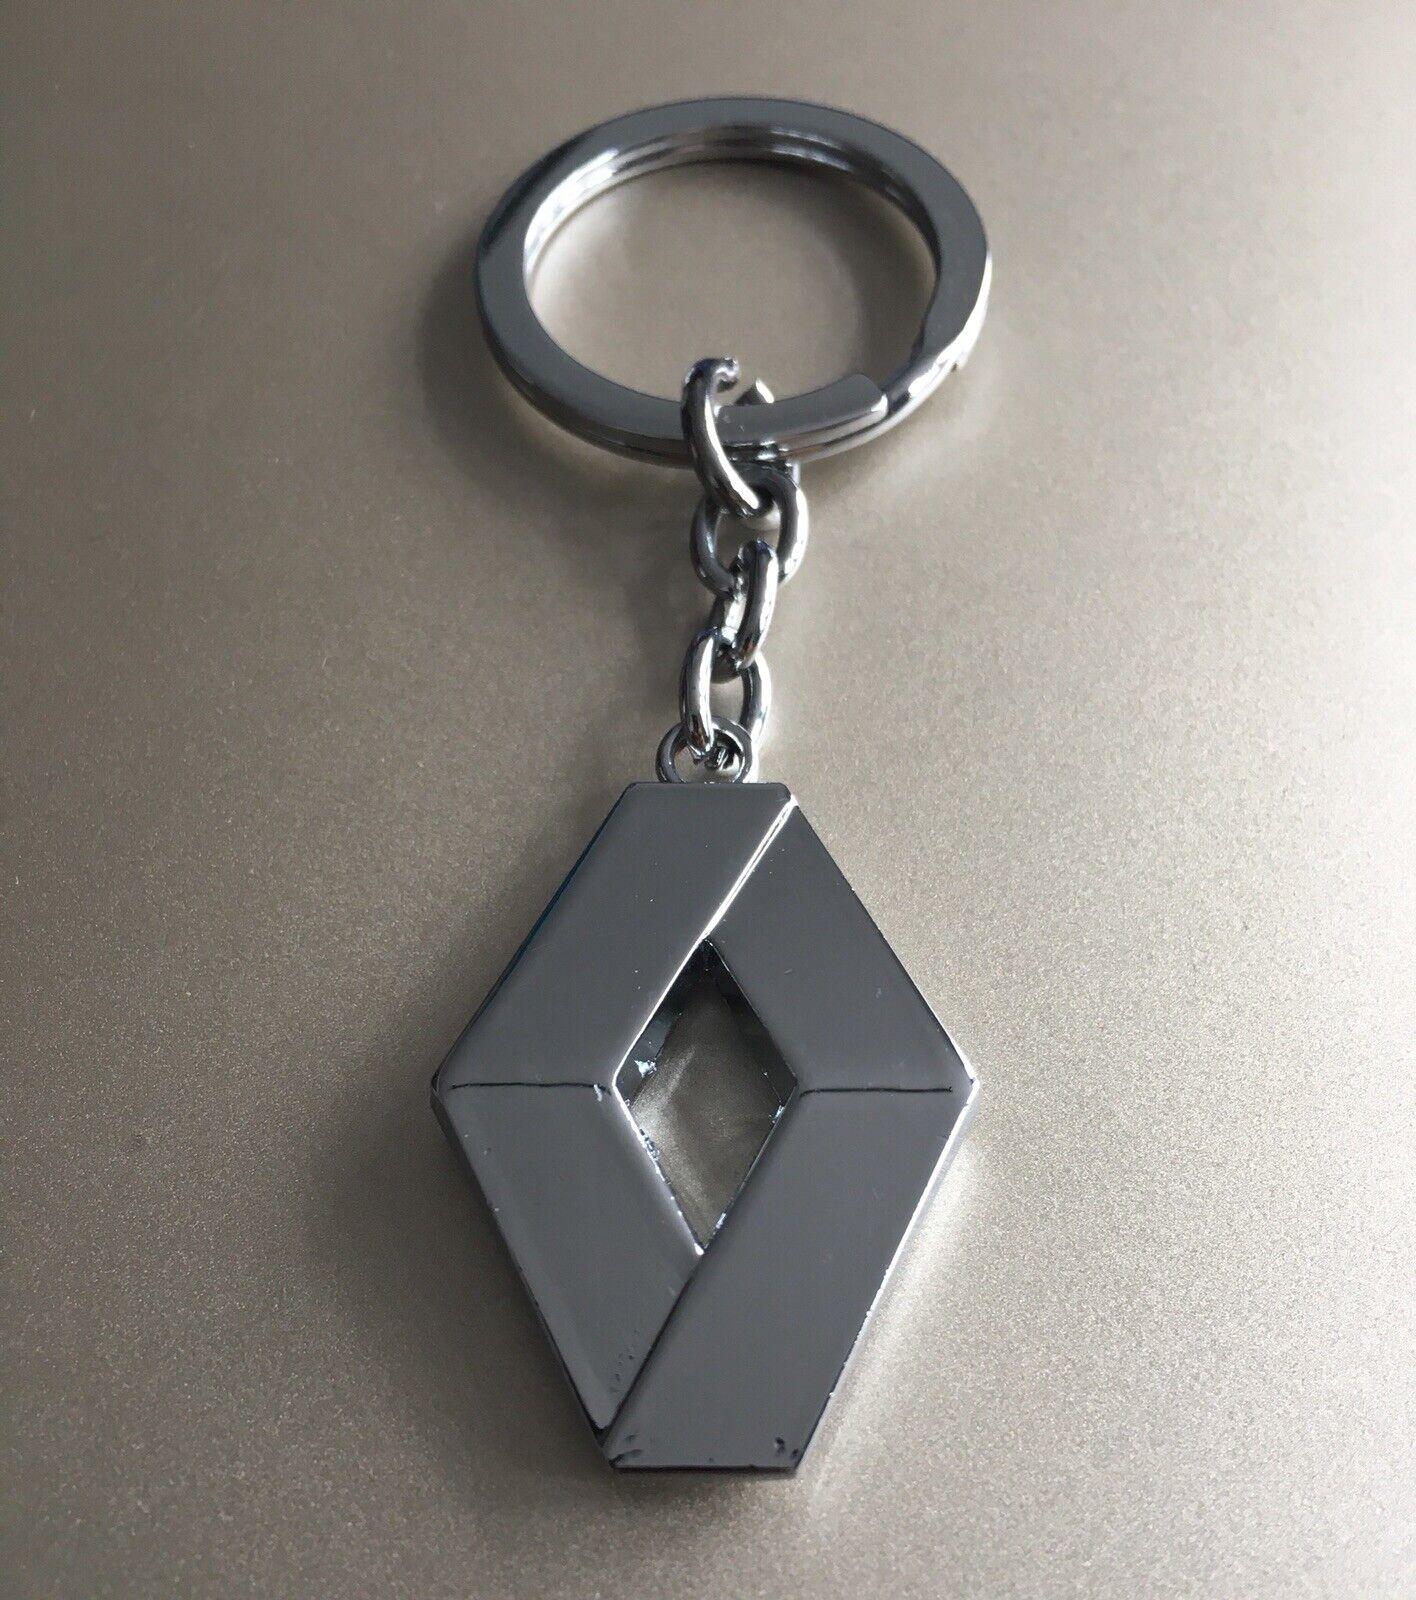 'RENAULT' Keyring Chrome Keychain Official Logo Silver Key Ring Car Metal Chain